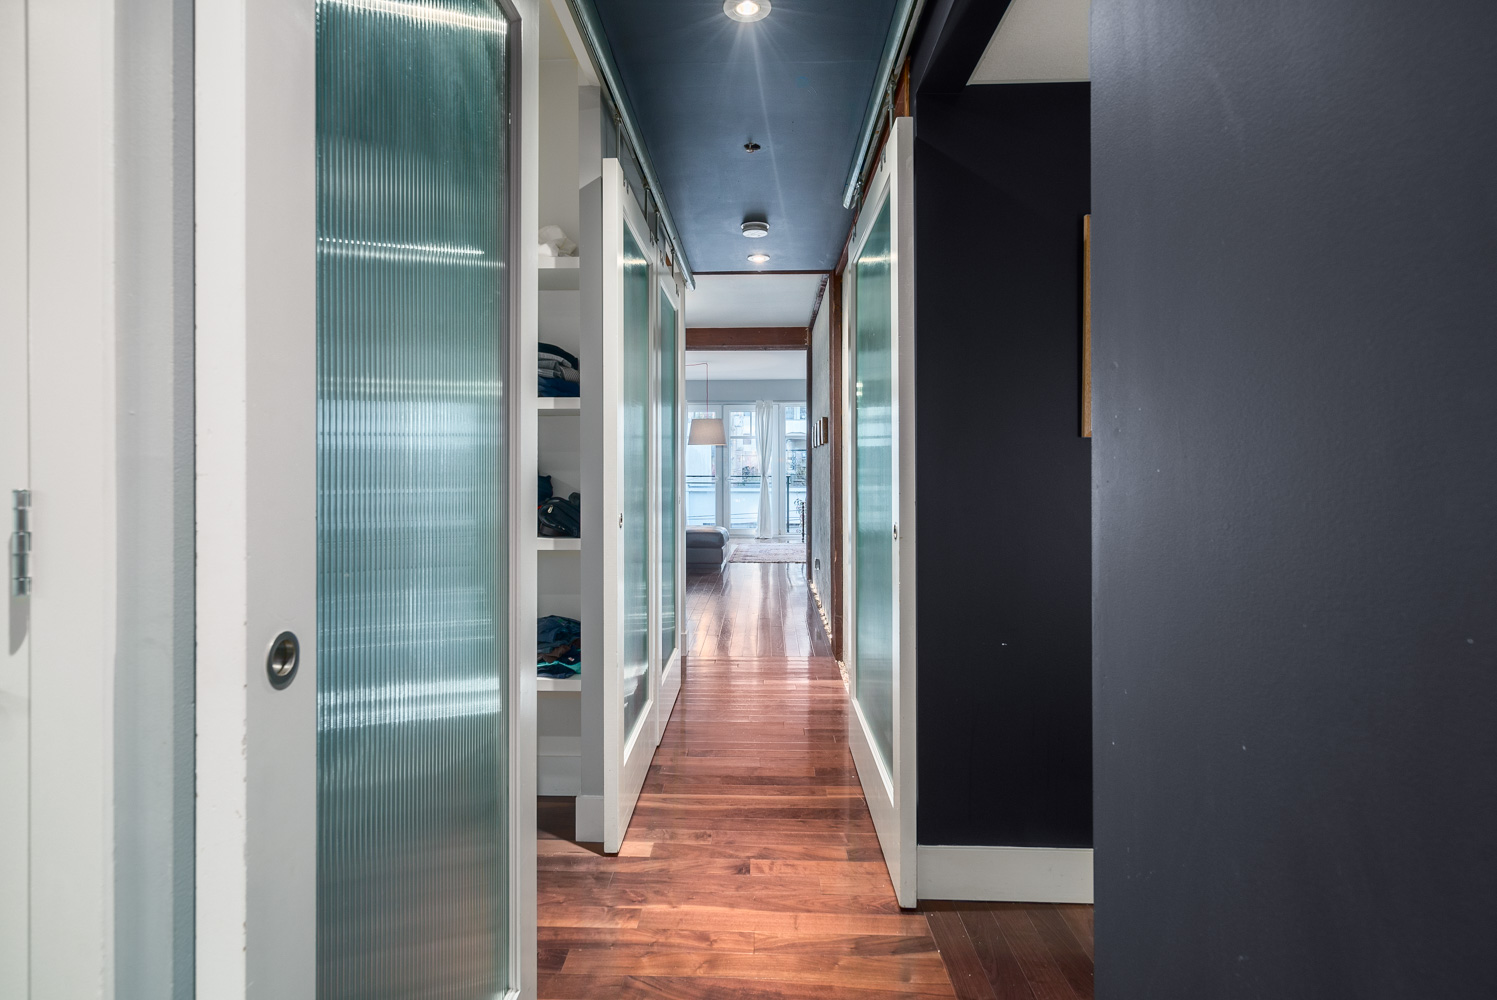 Alluring hallway reveals rustic style barn doors, concrete walls set off with rich walnut floors